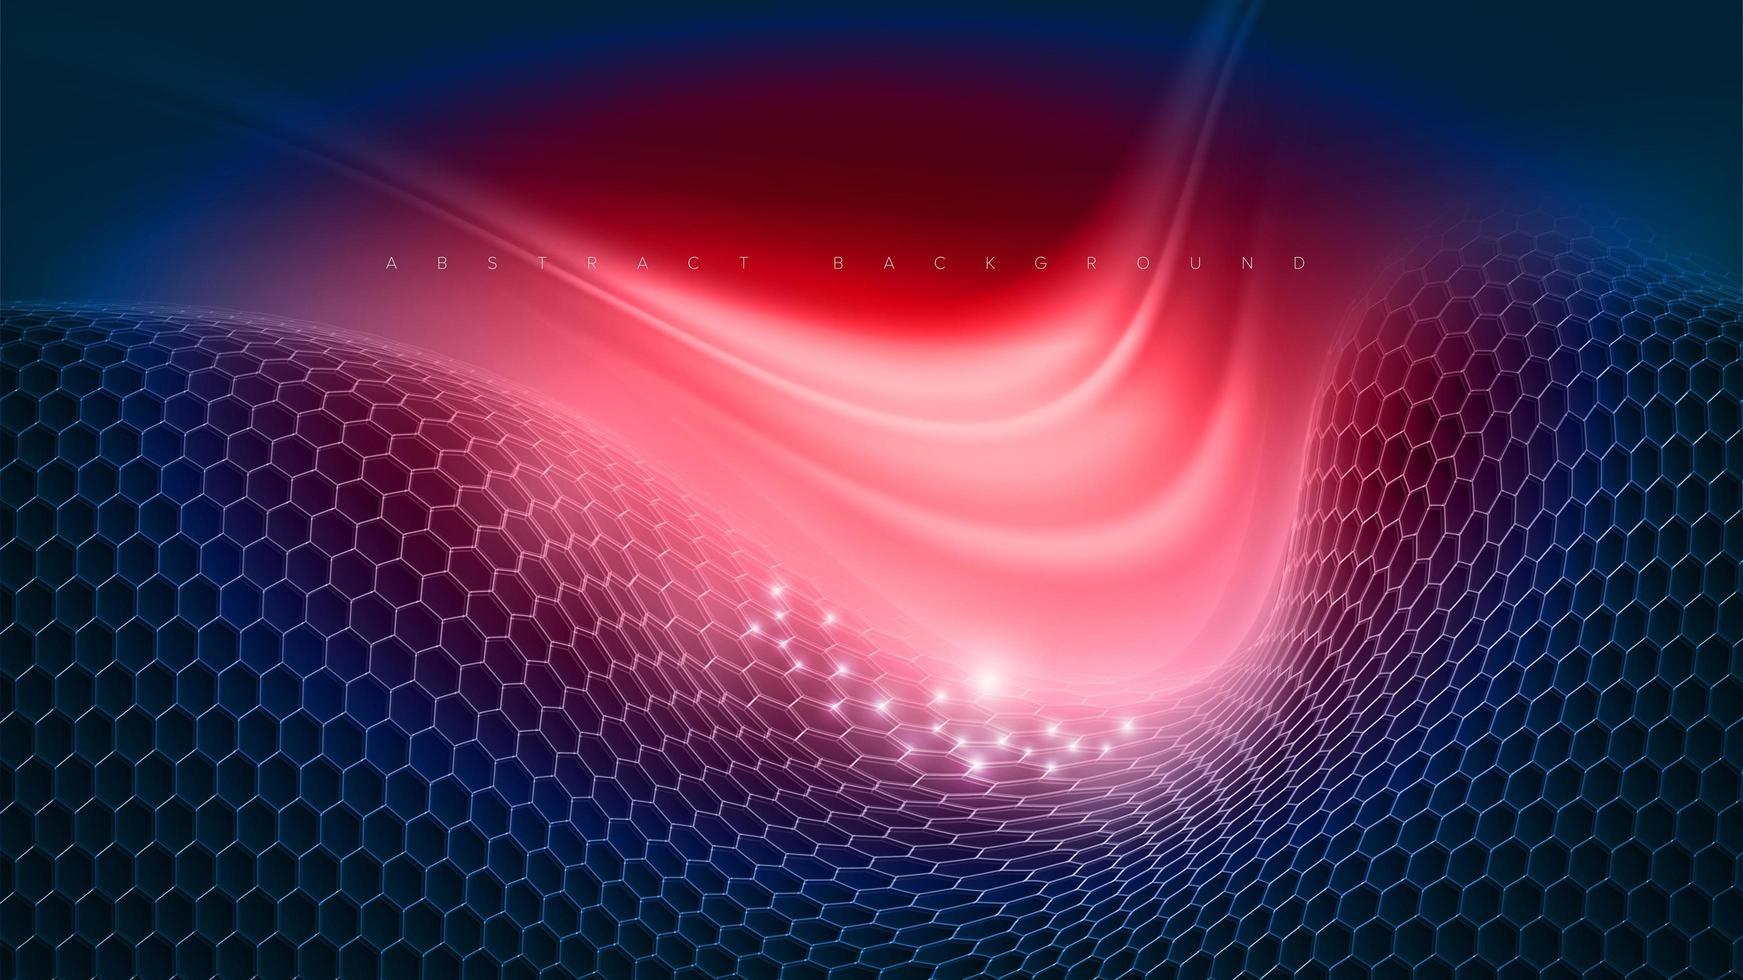 Abstract Glowing Futuristic Hexagon Design vector